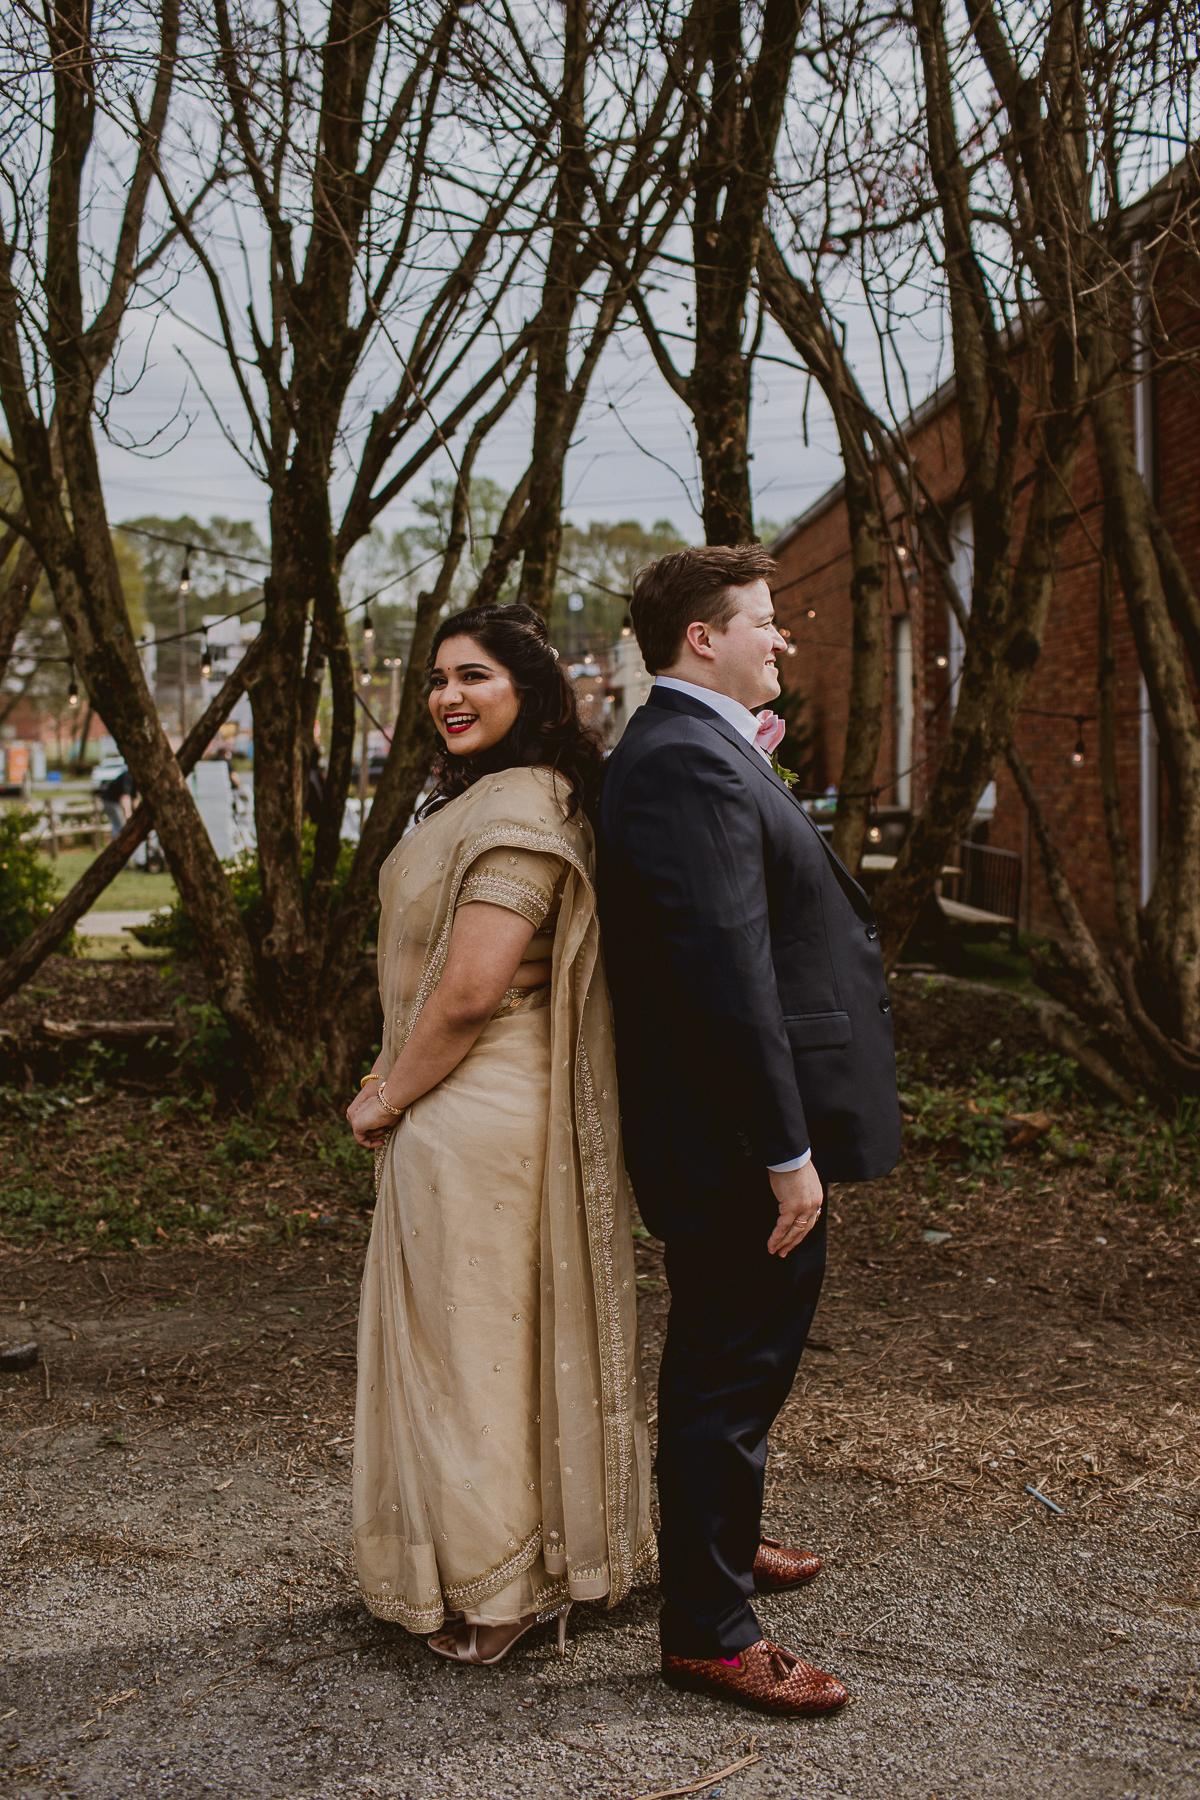 eventide-brewery-indian-american-fusion-kelley-raye-atlanta-los-angeles-wedding-photographer-7.jpg